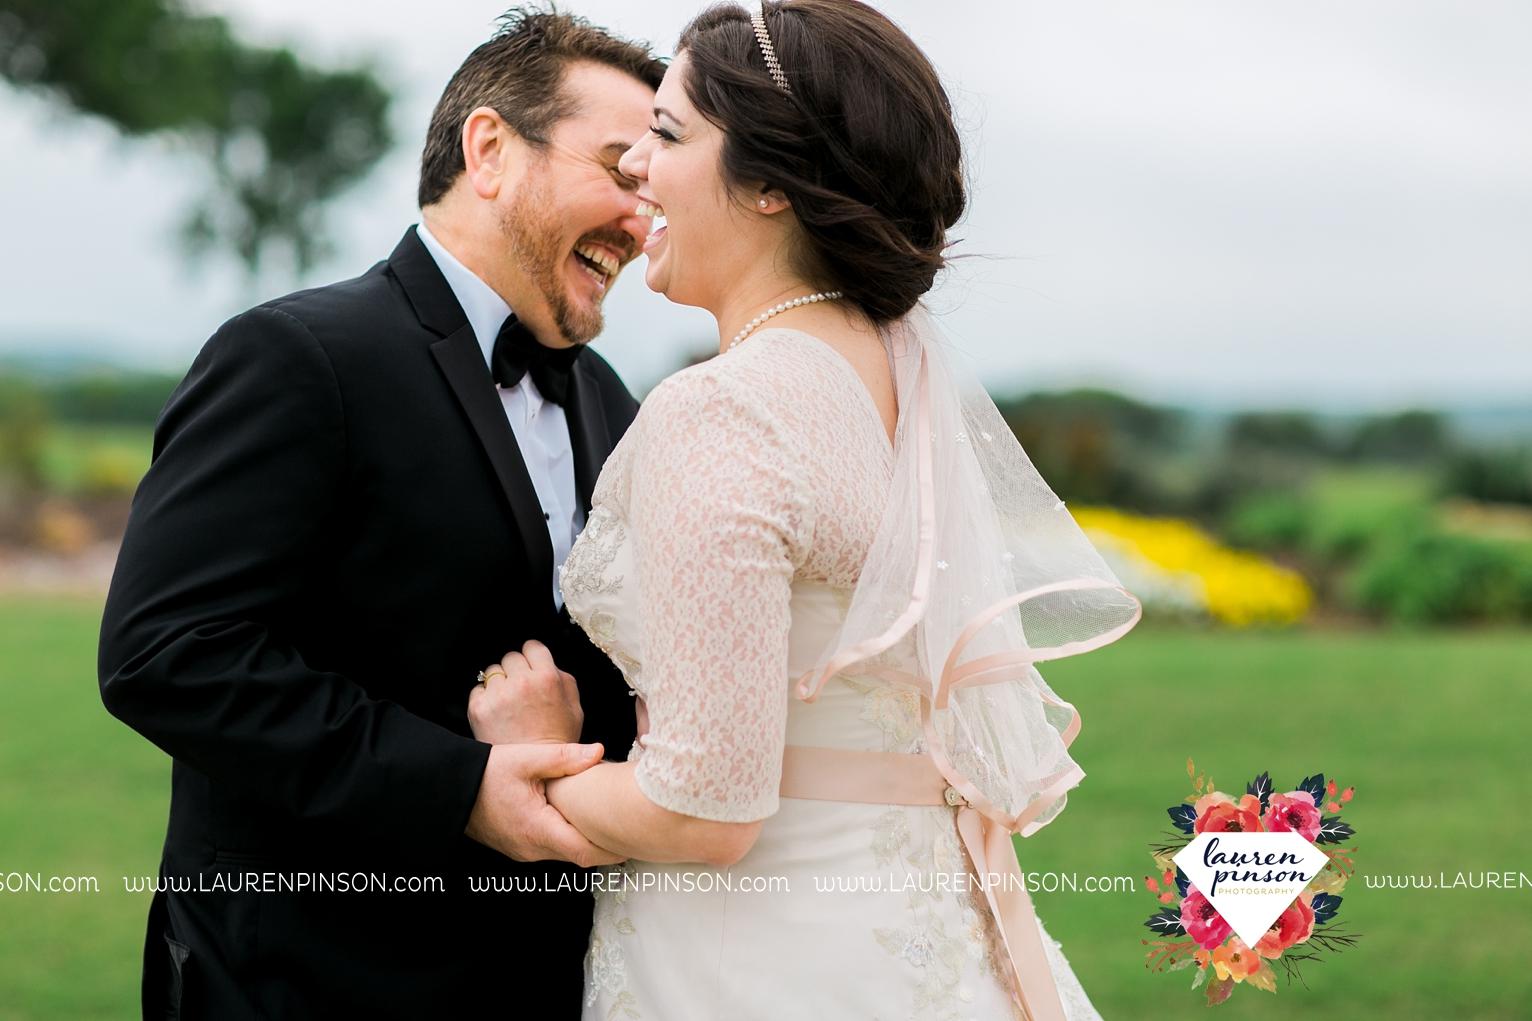 gainesville-texas-sherman-texas-thackerville-oklahoma-wedding-photographer-at-winstar-casino-golf-resort_2276.jpg